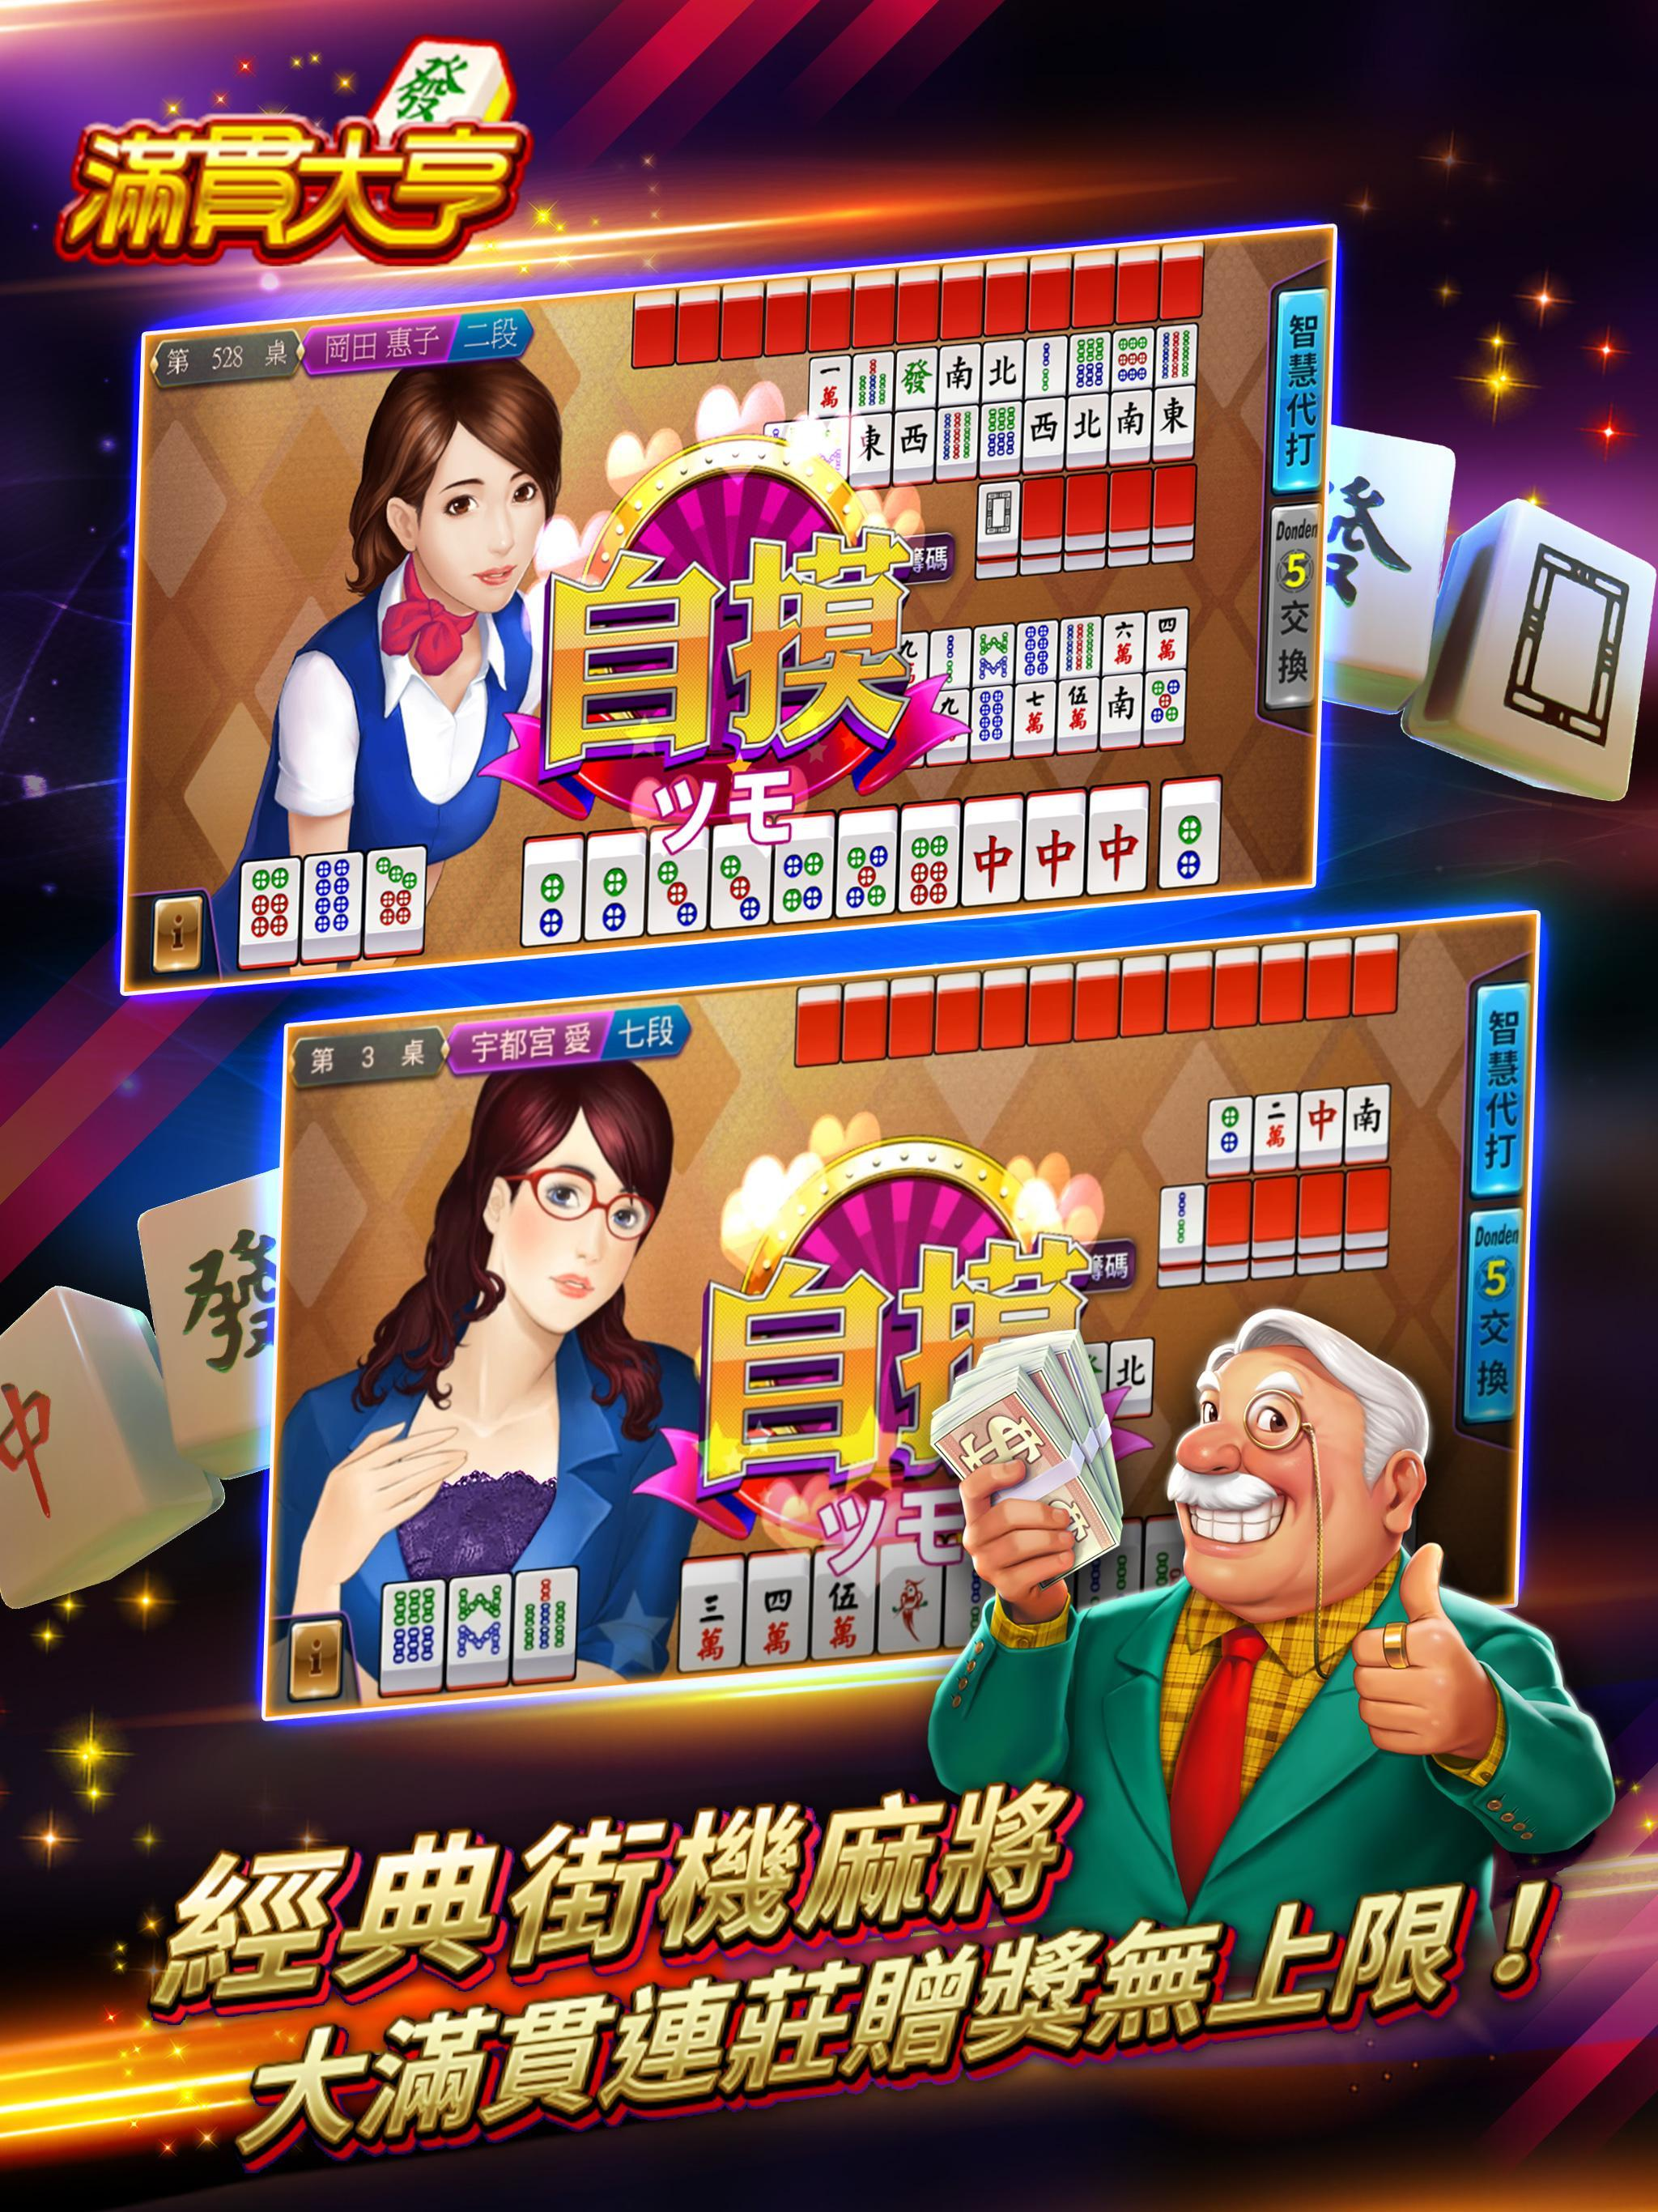 ManganDahen Casino - Free Slot 1.1.123 Screenshot 9